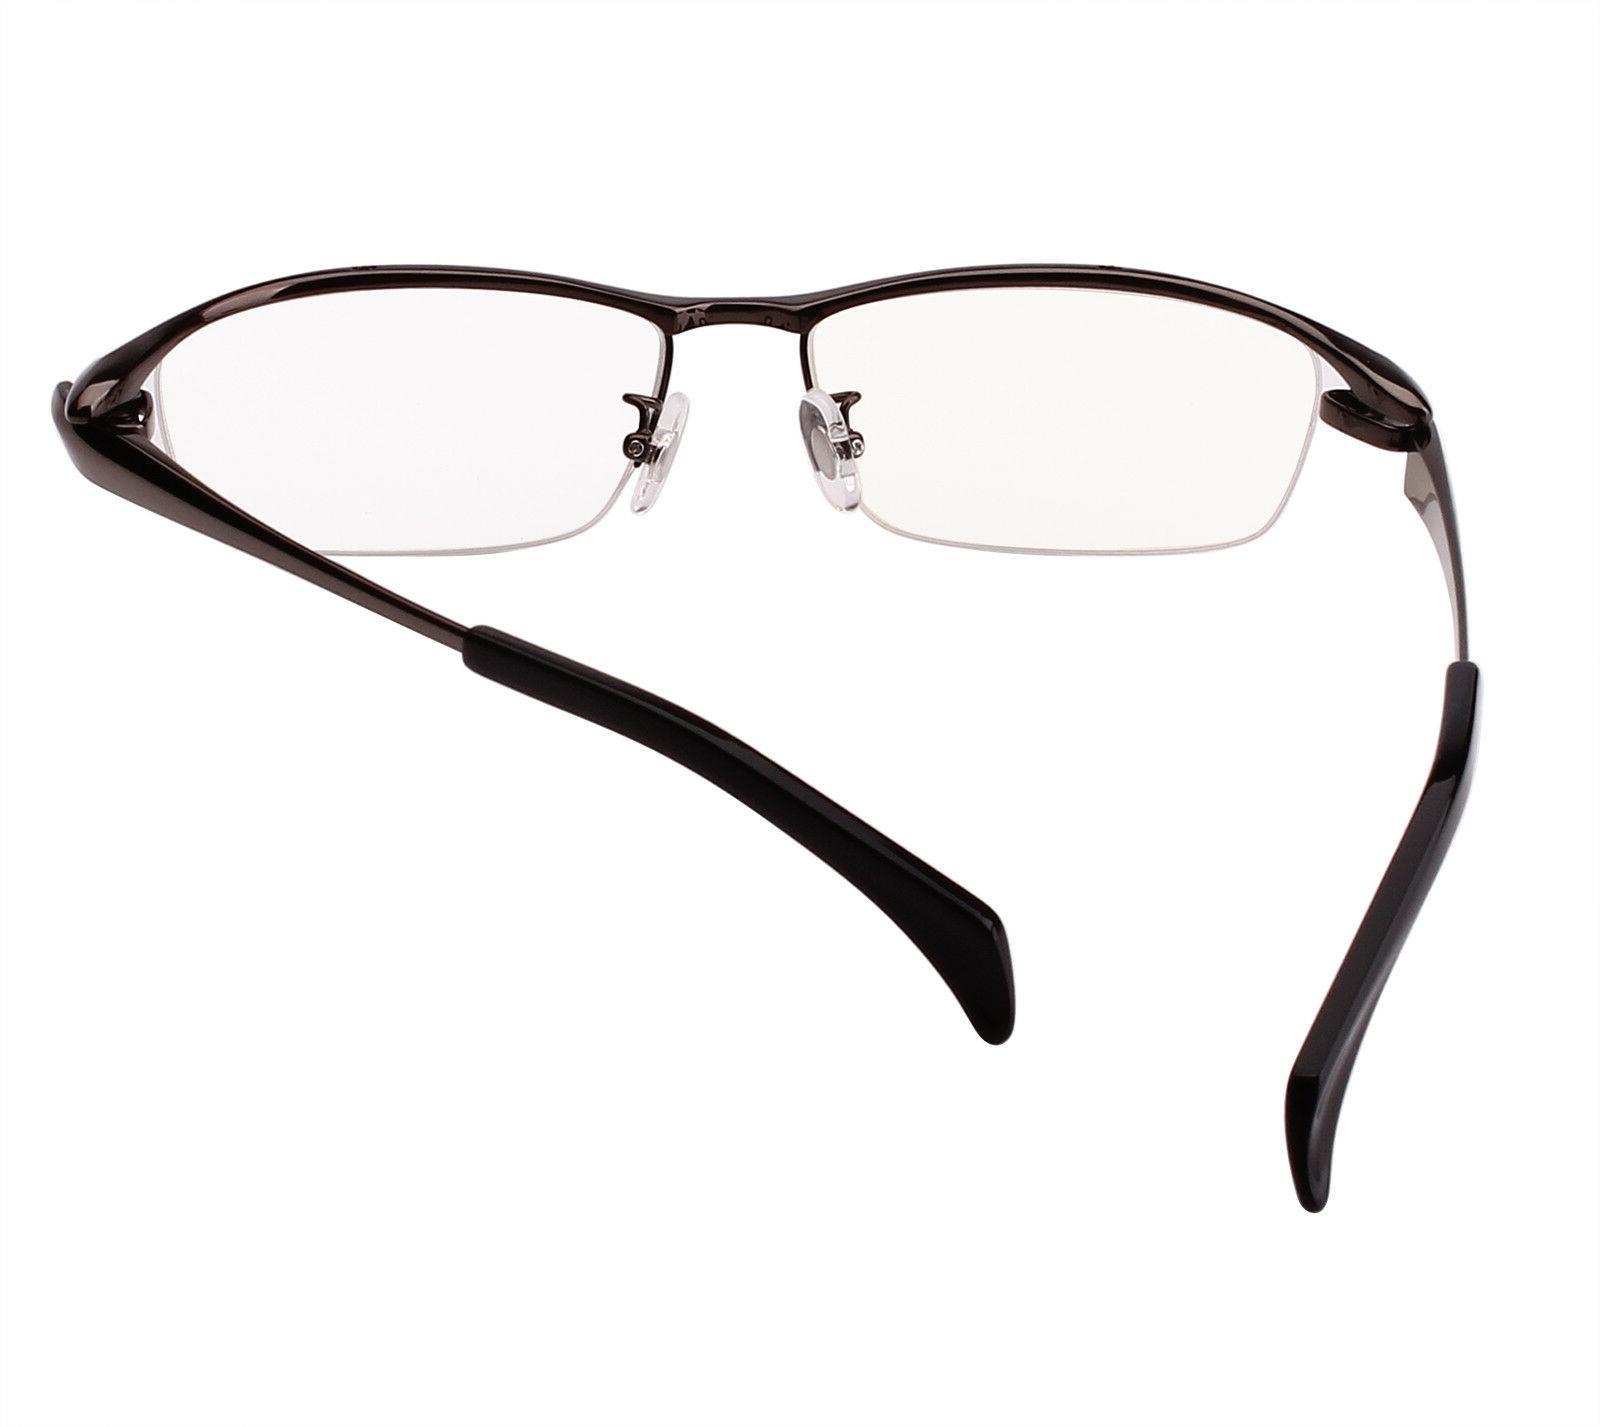 Agstum Titanium Mens Half Eyeglasses Frames